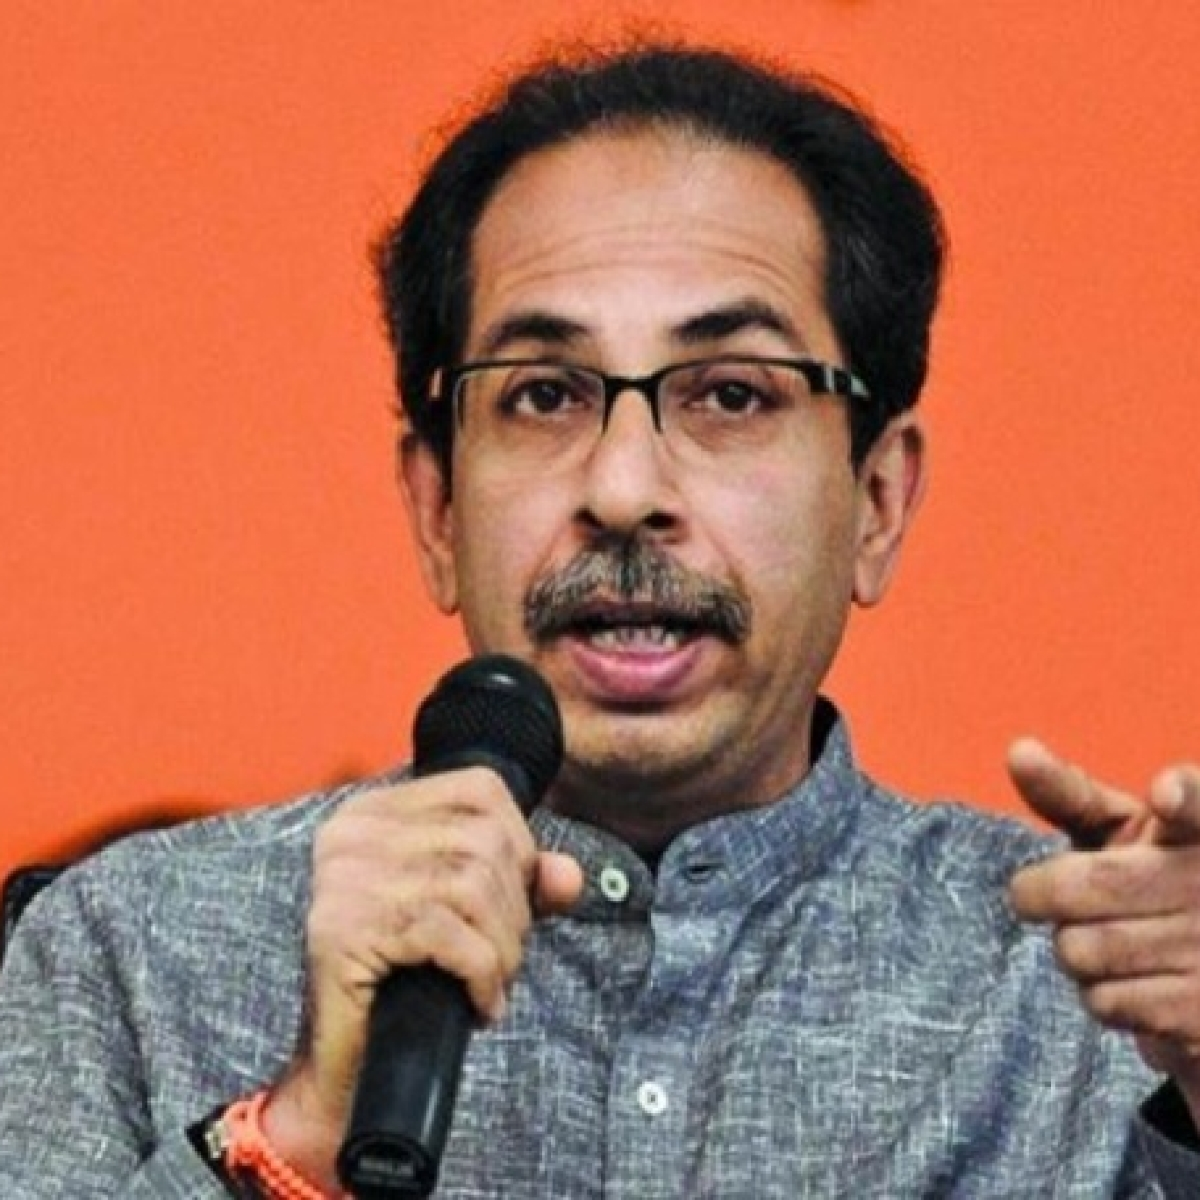 Shiv Sena goons assault govt employee for social media post against CM Uddhav Thackeray